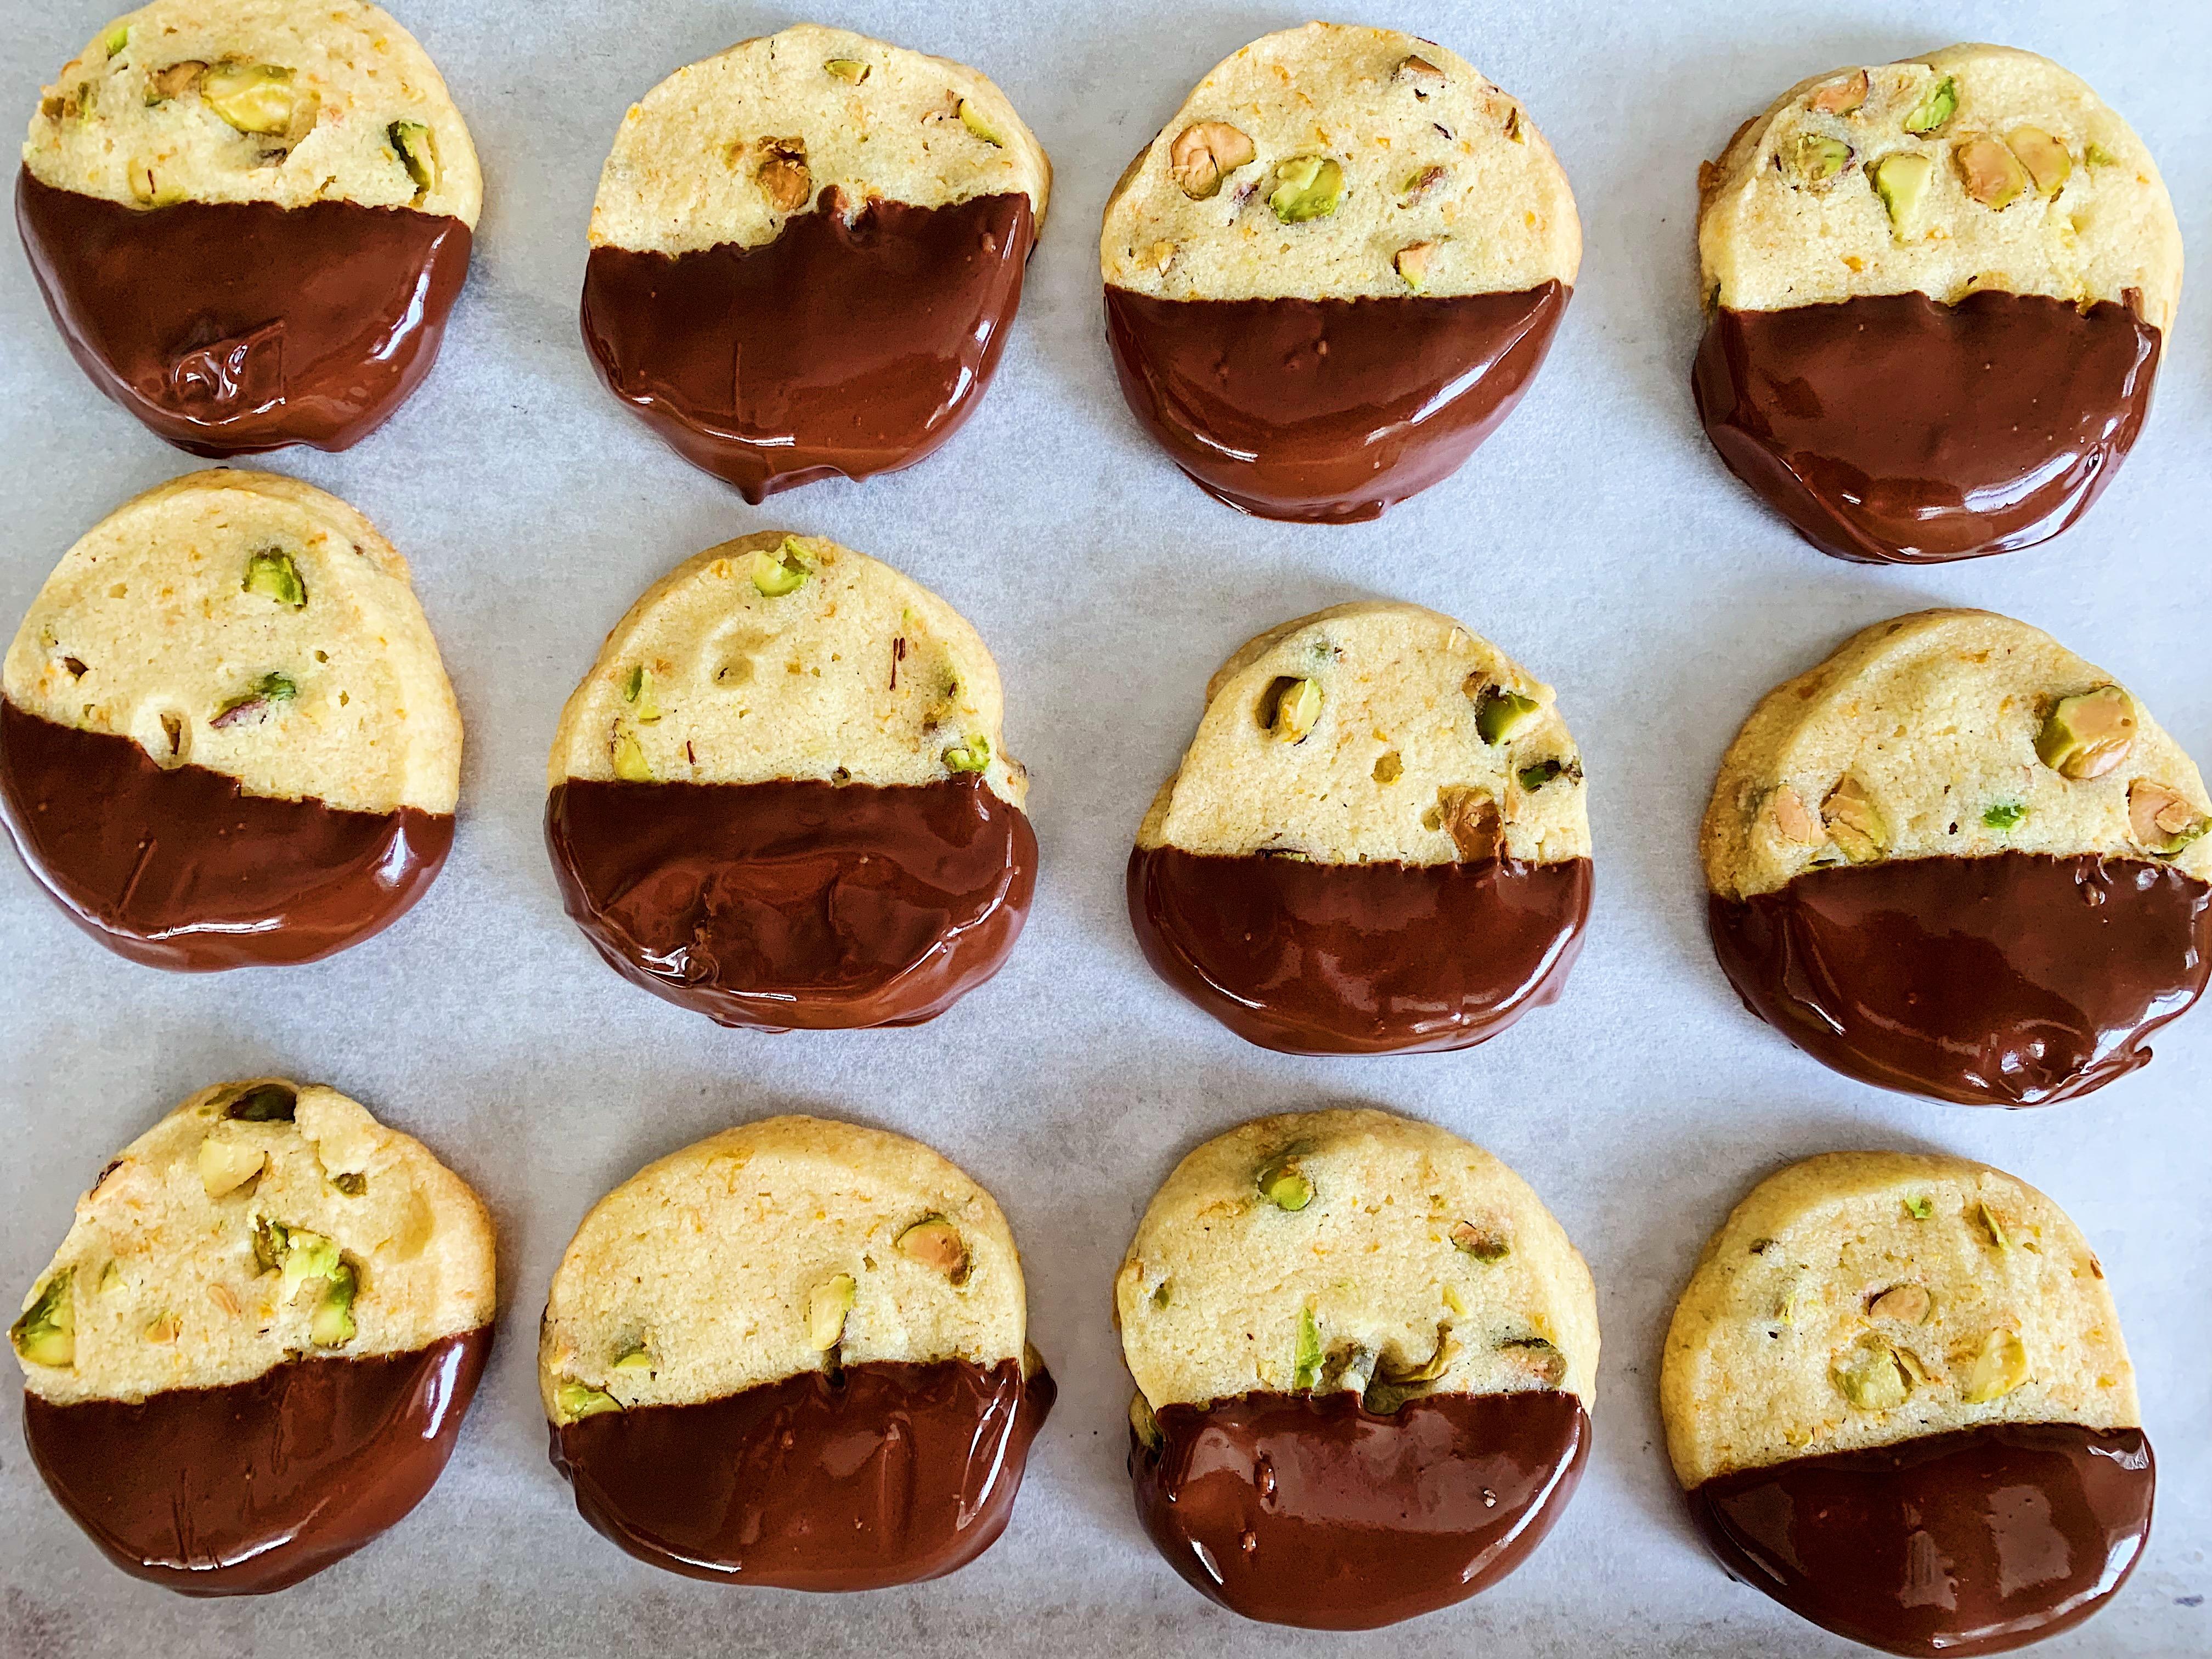 Chocolate-Dipped Orange Pistachio Cookies